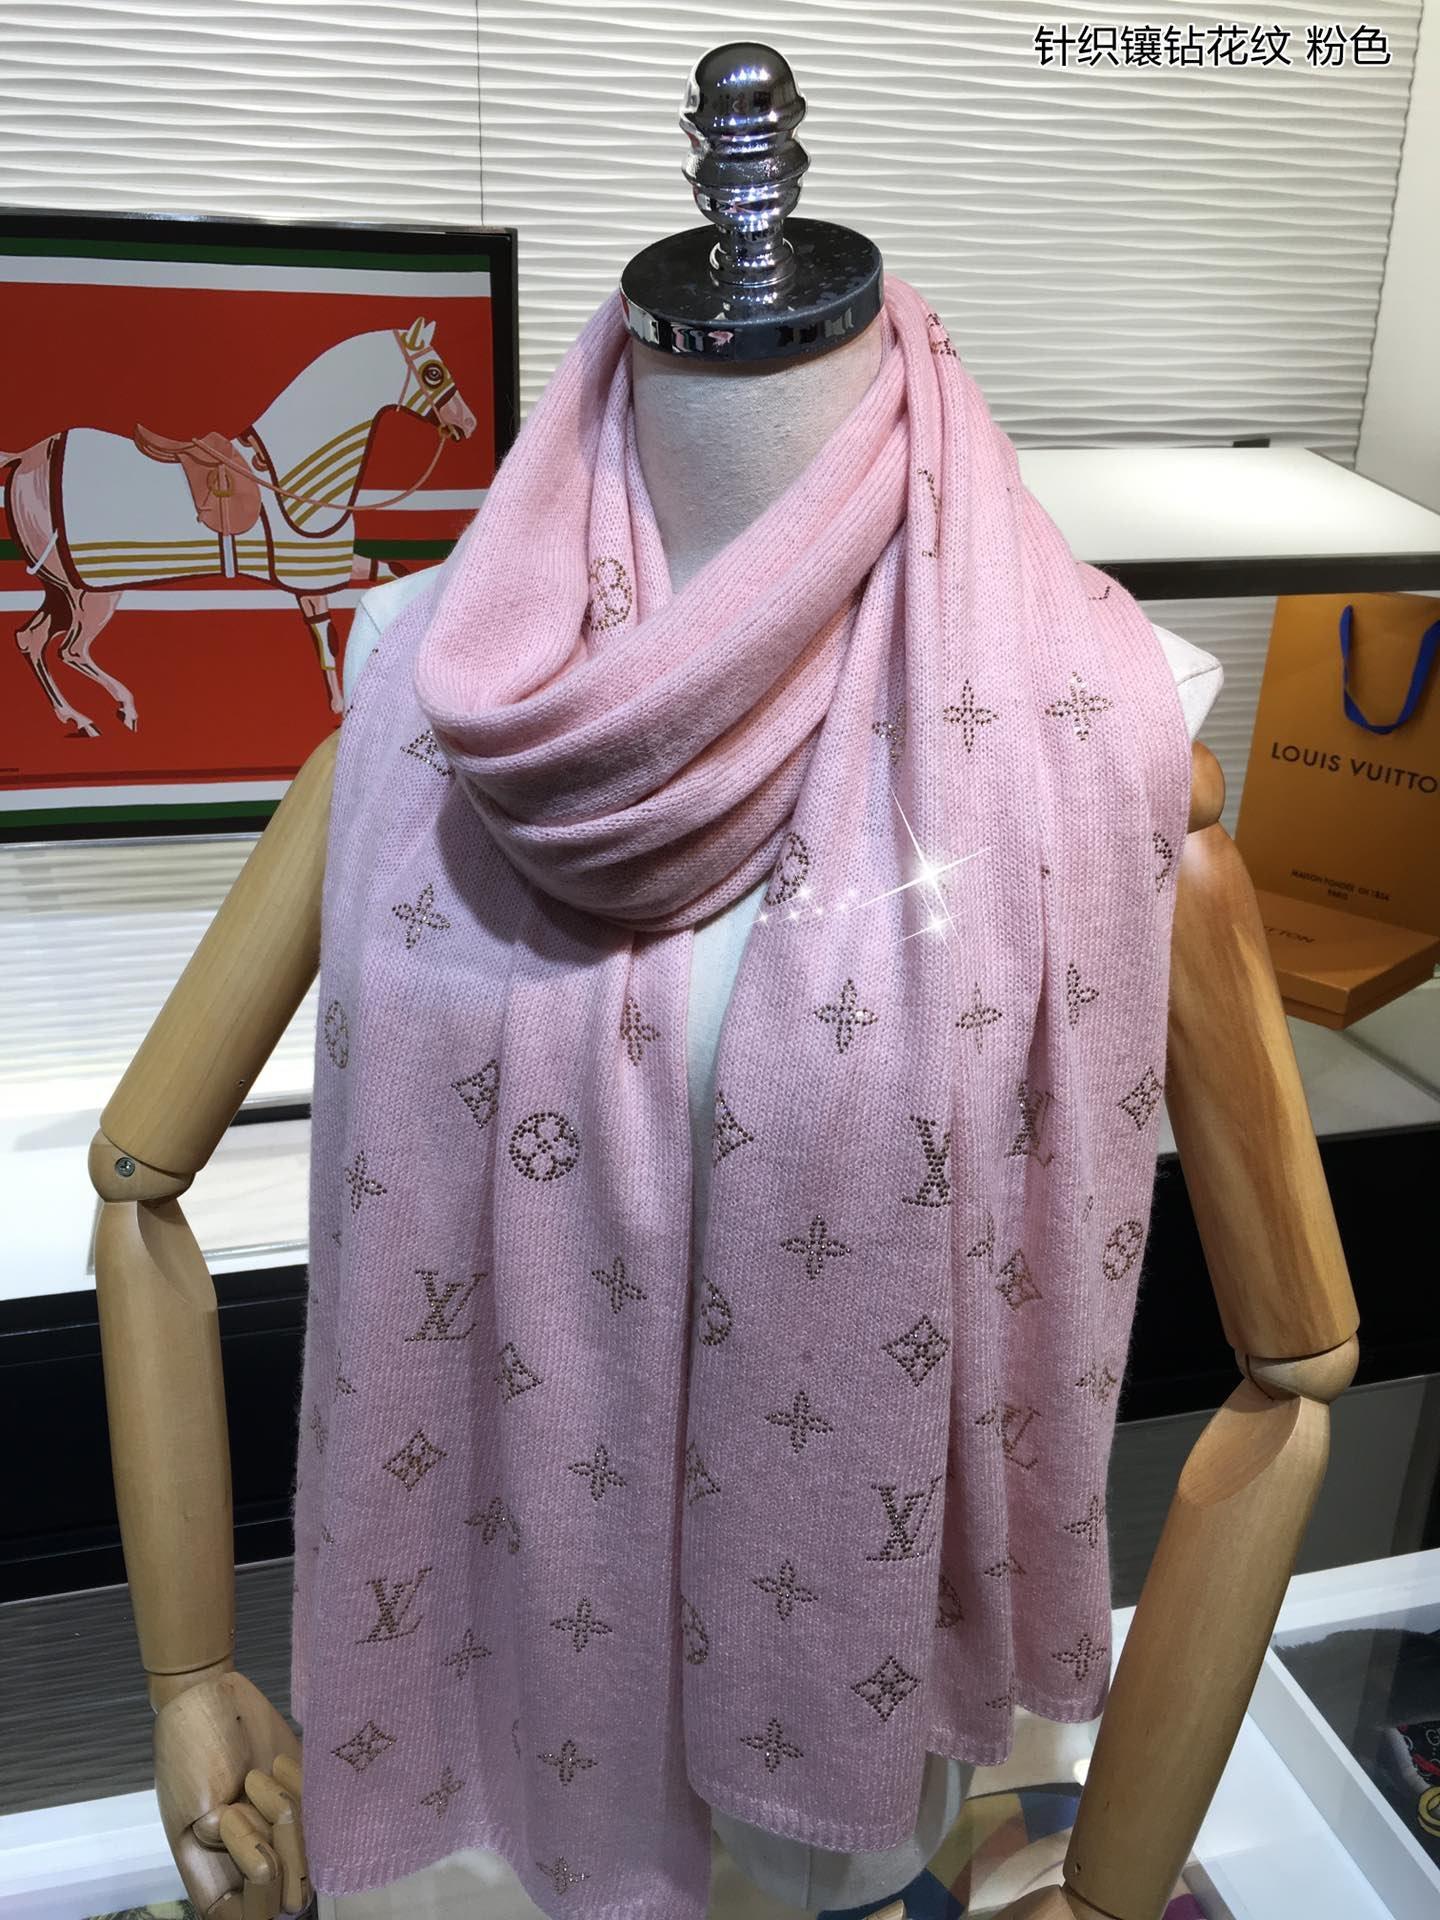 Replica Louis Vuitton Women Scarf 0020